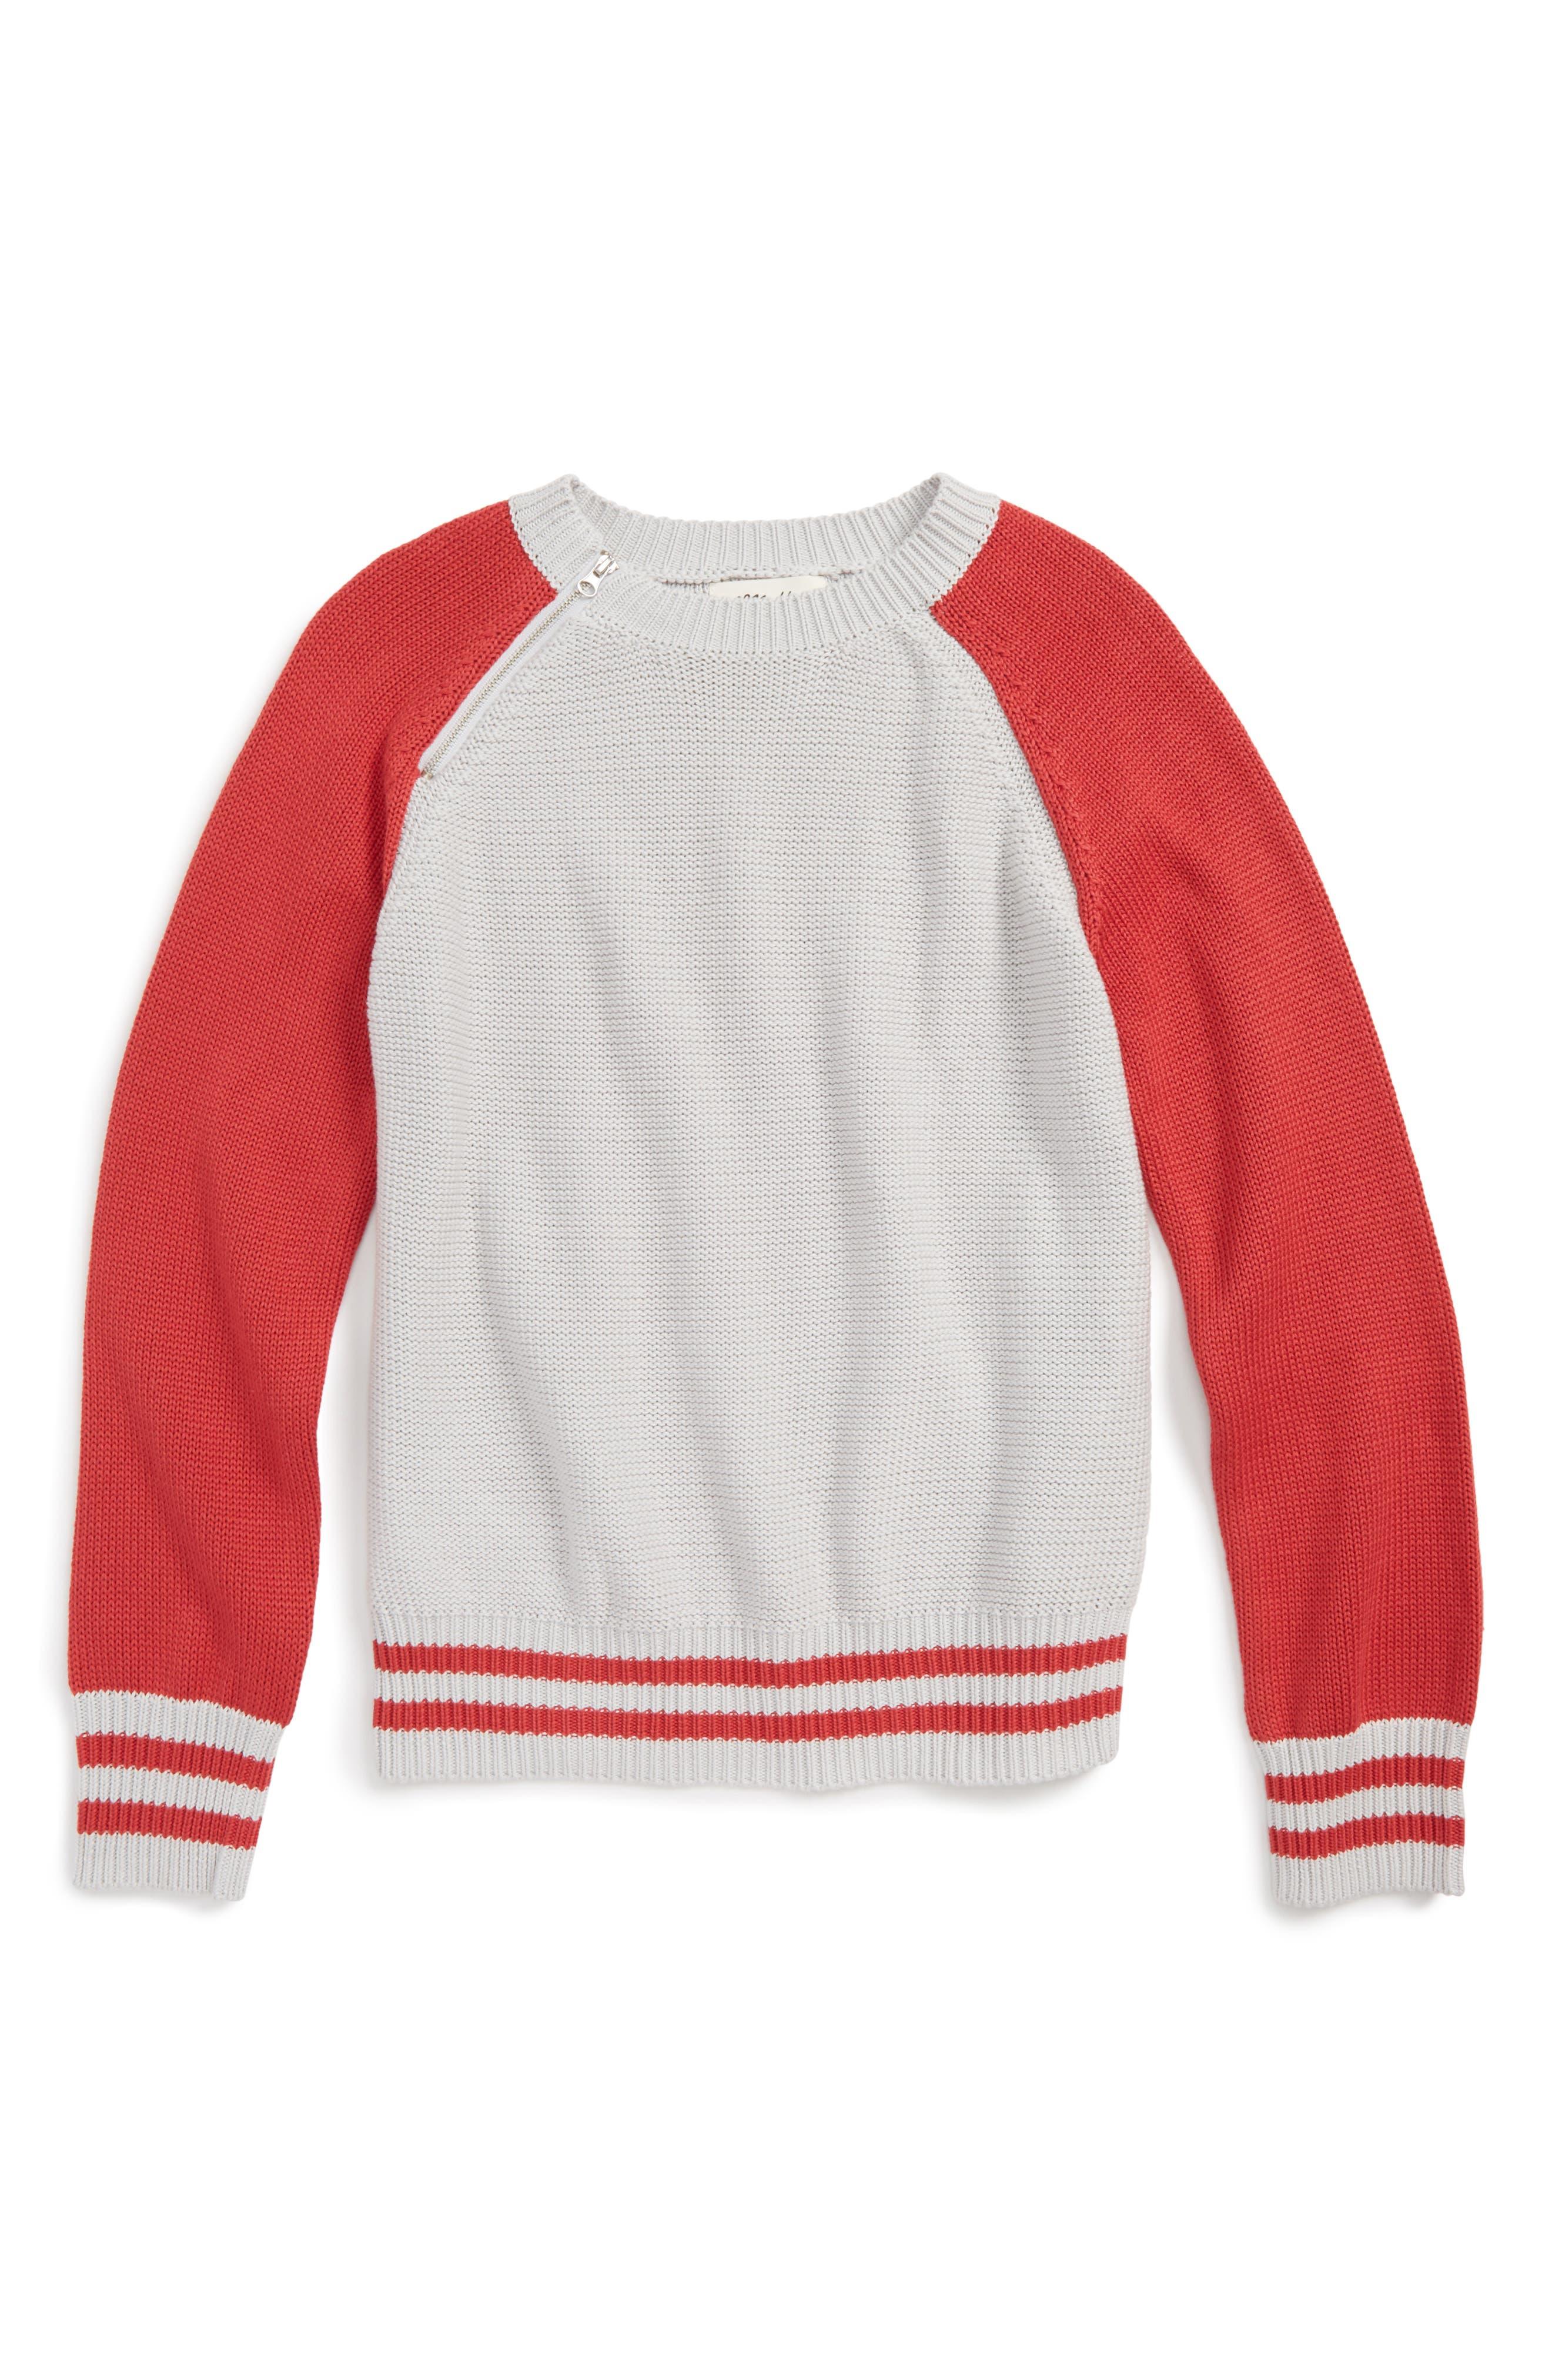 Colorblock Raglan Sweater,                         Main,                         color, Orange/ Ivo